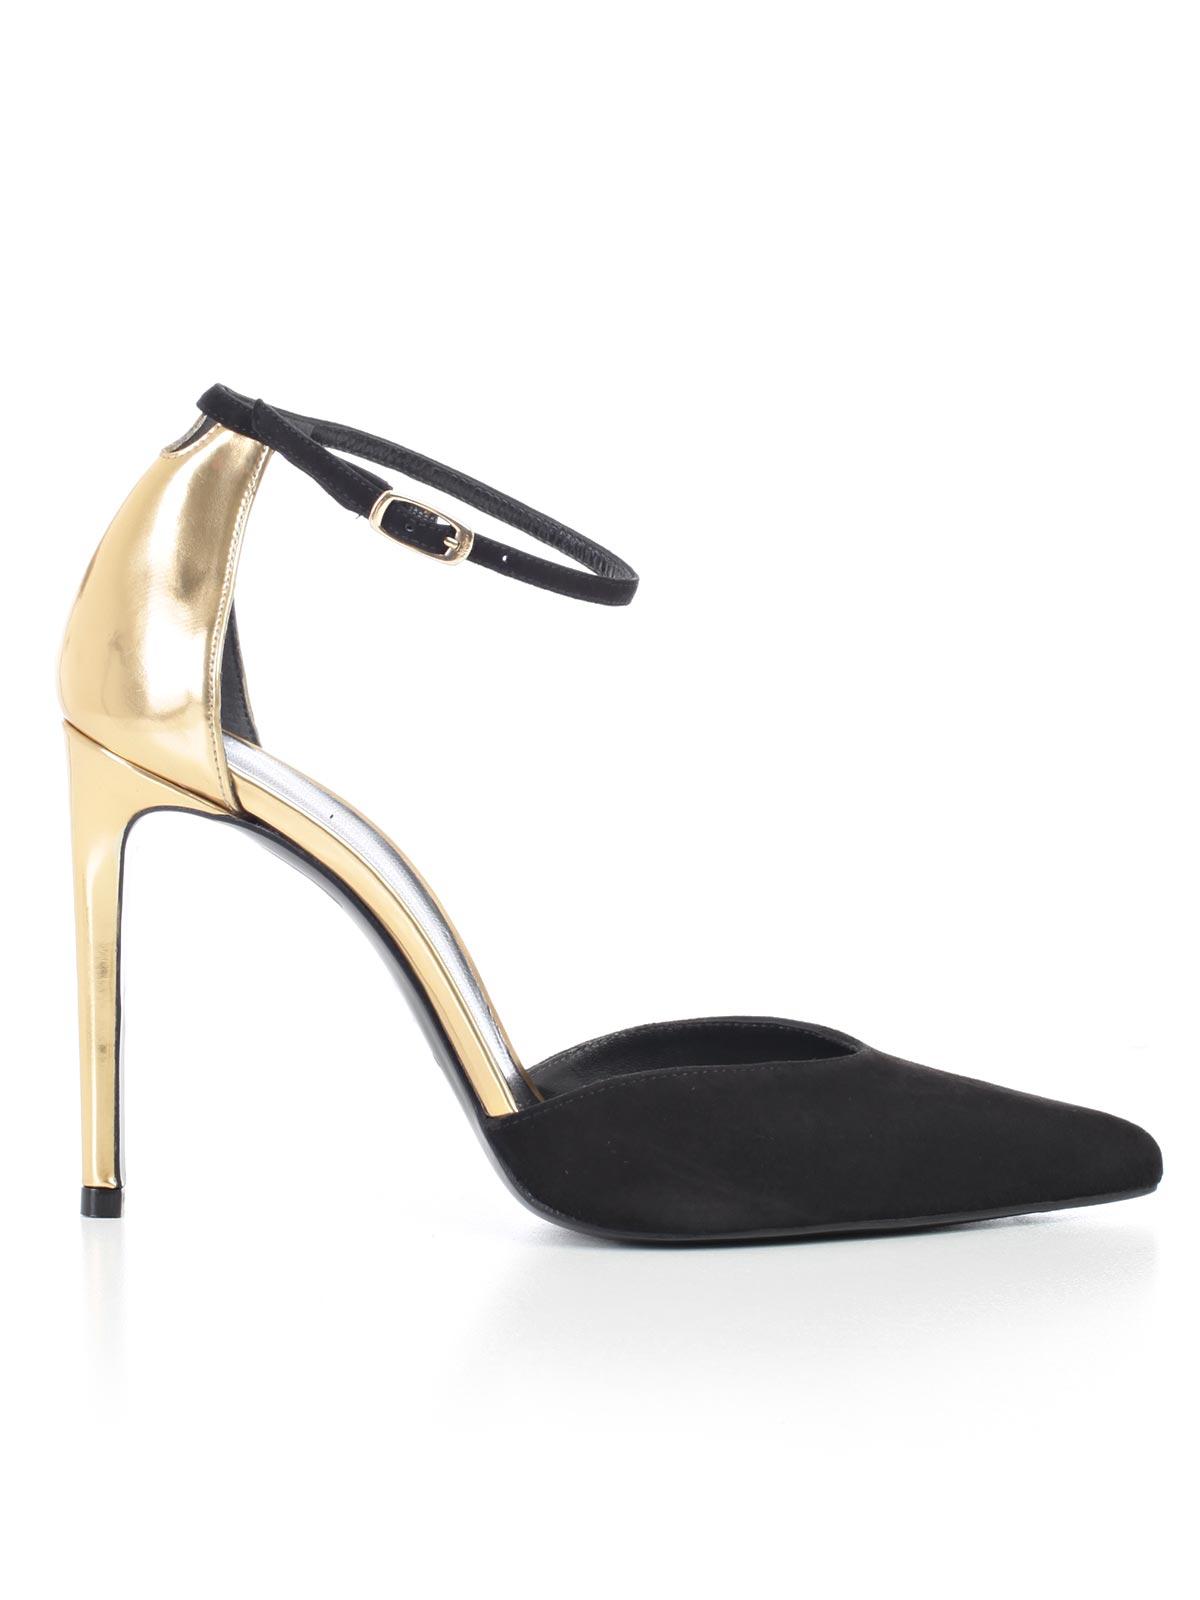 Picture of STUART WEITZMAN Footwear